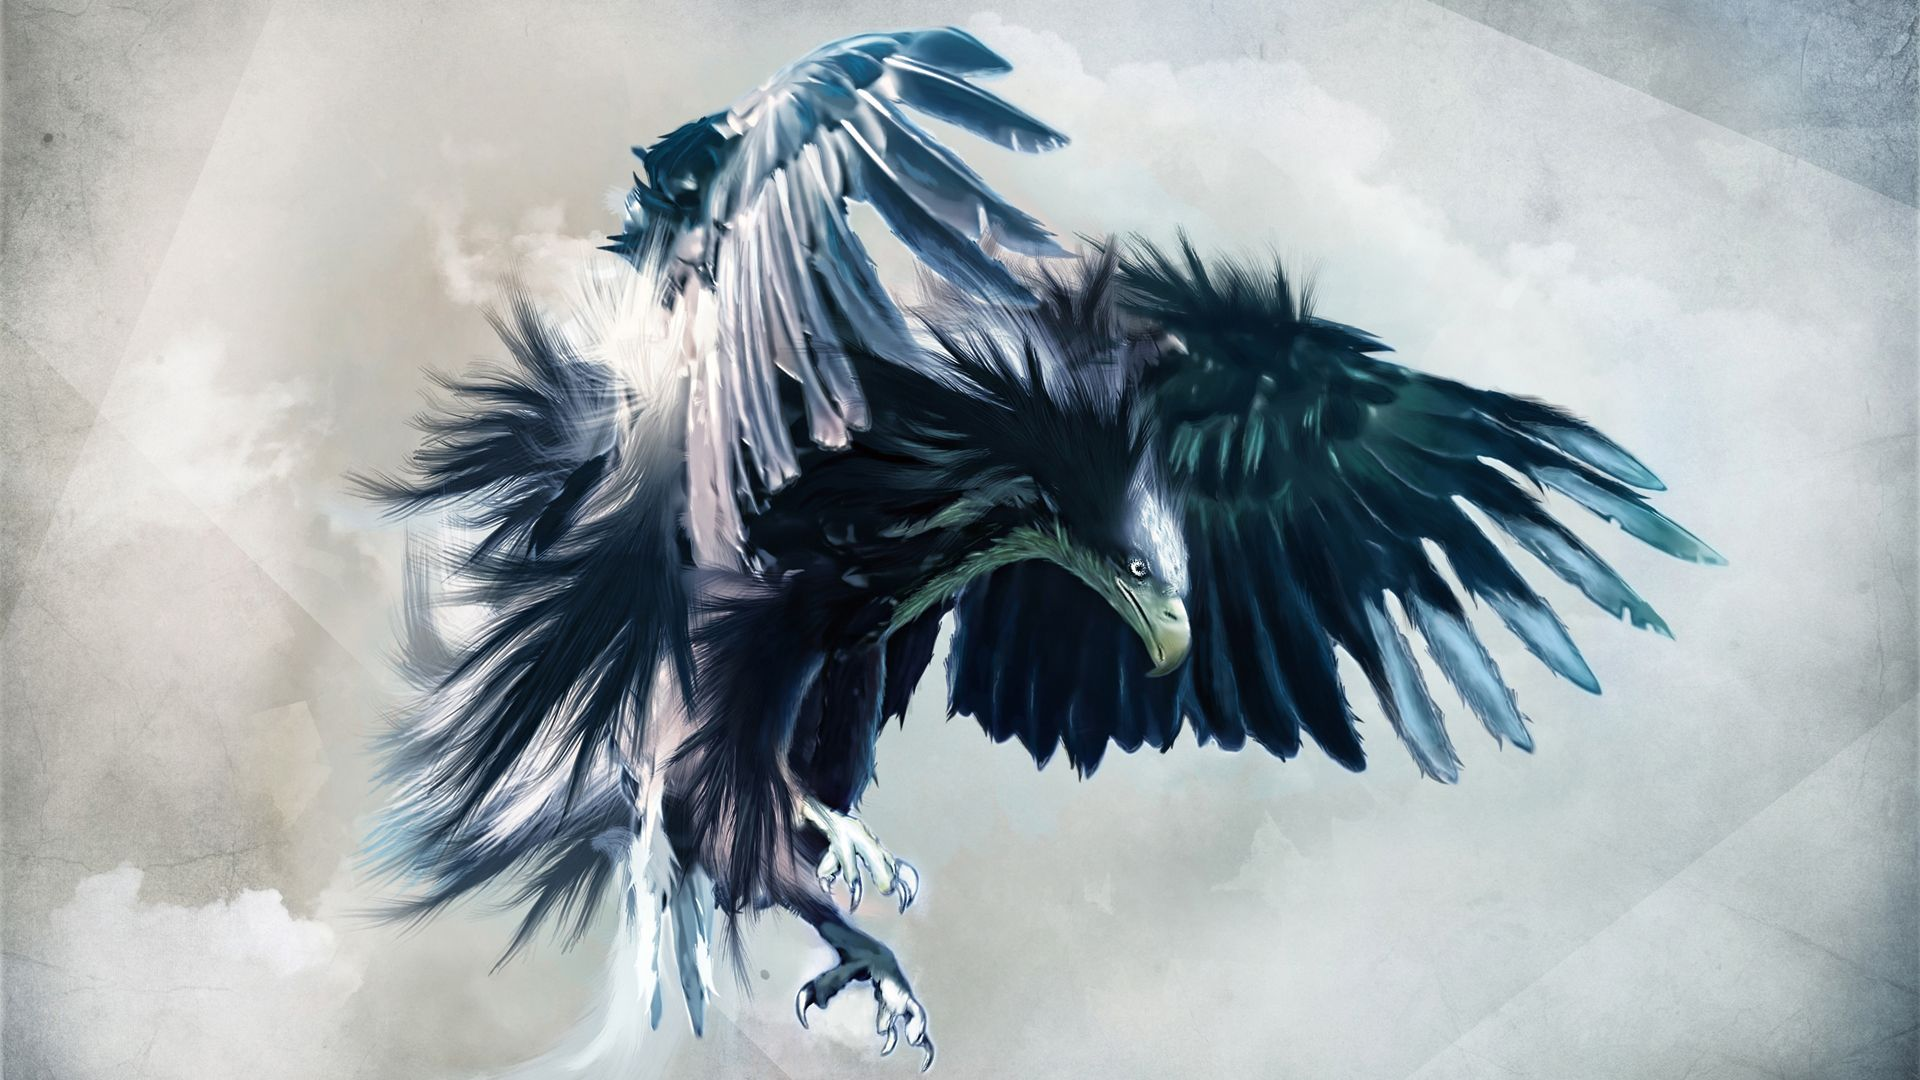 Resultado de imagem para mystic eagle wallpaper